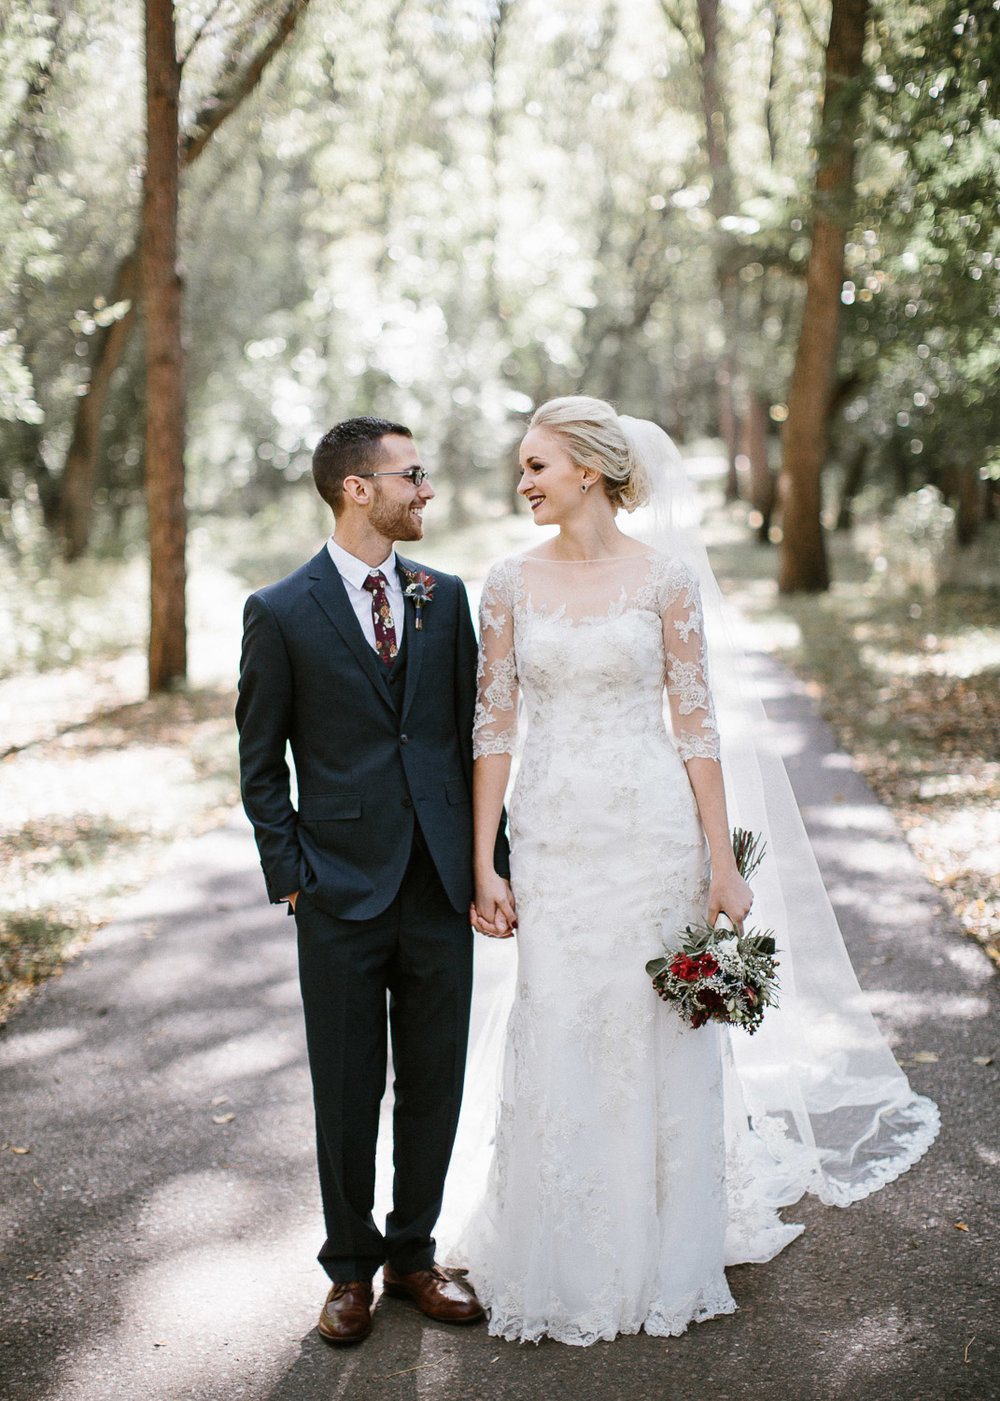 Jenna&Austin_SiouxFalls_Wedding_Photography_14.jpg